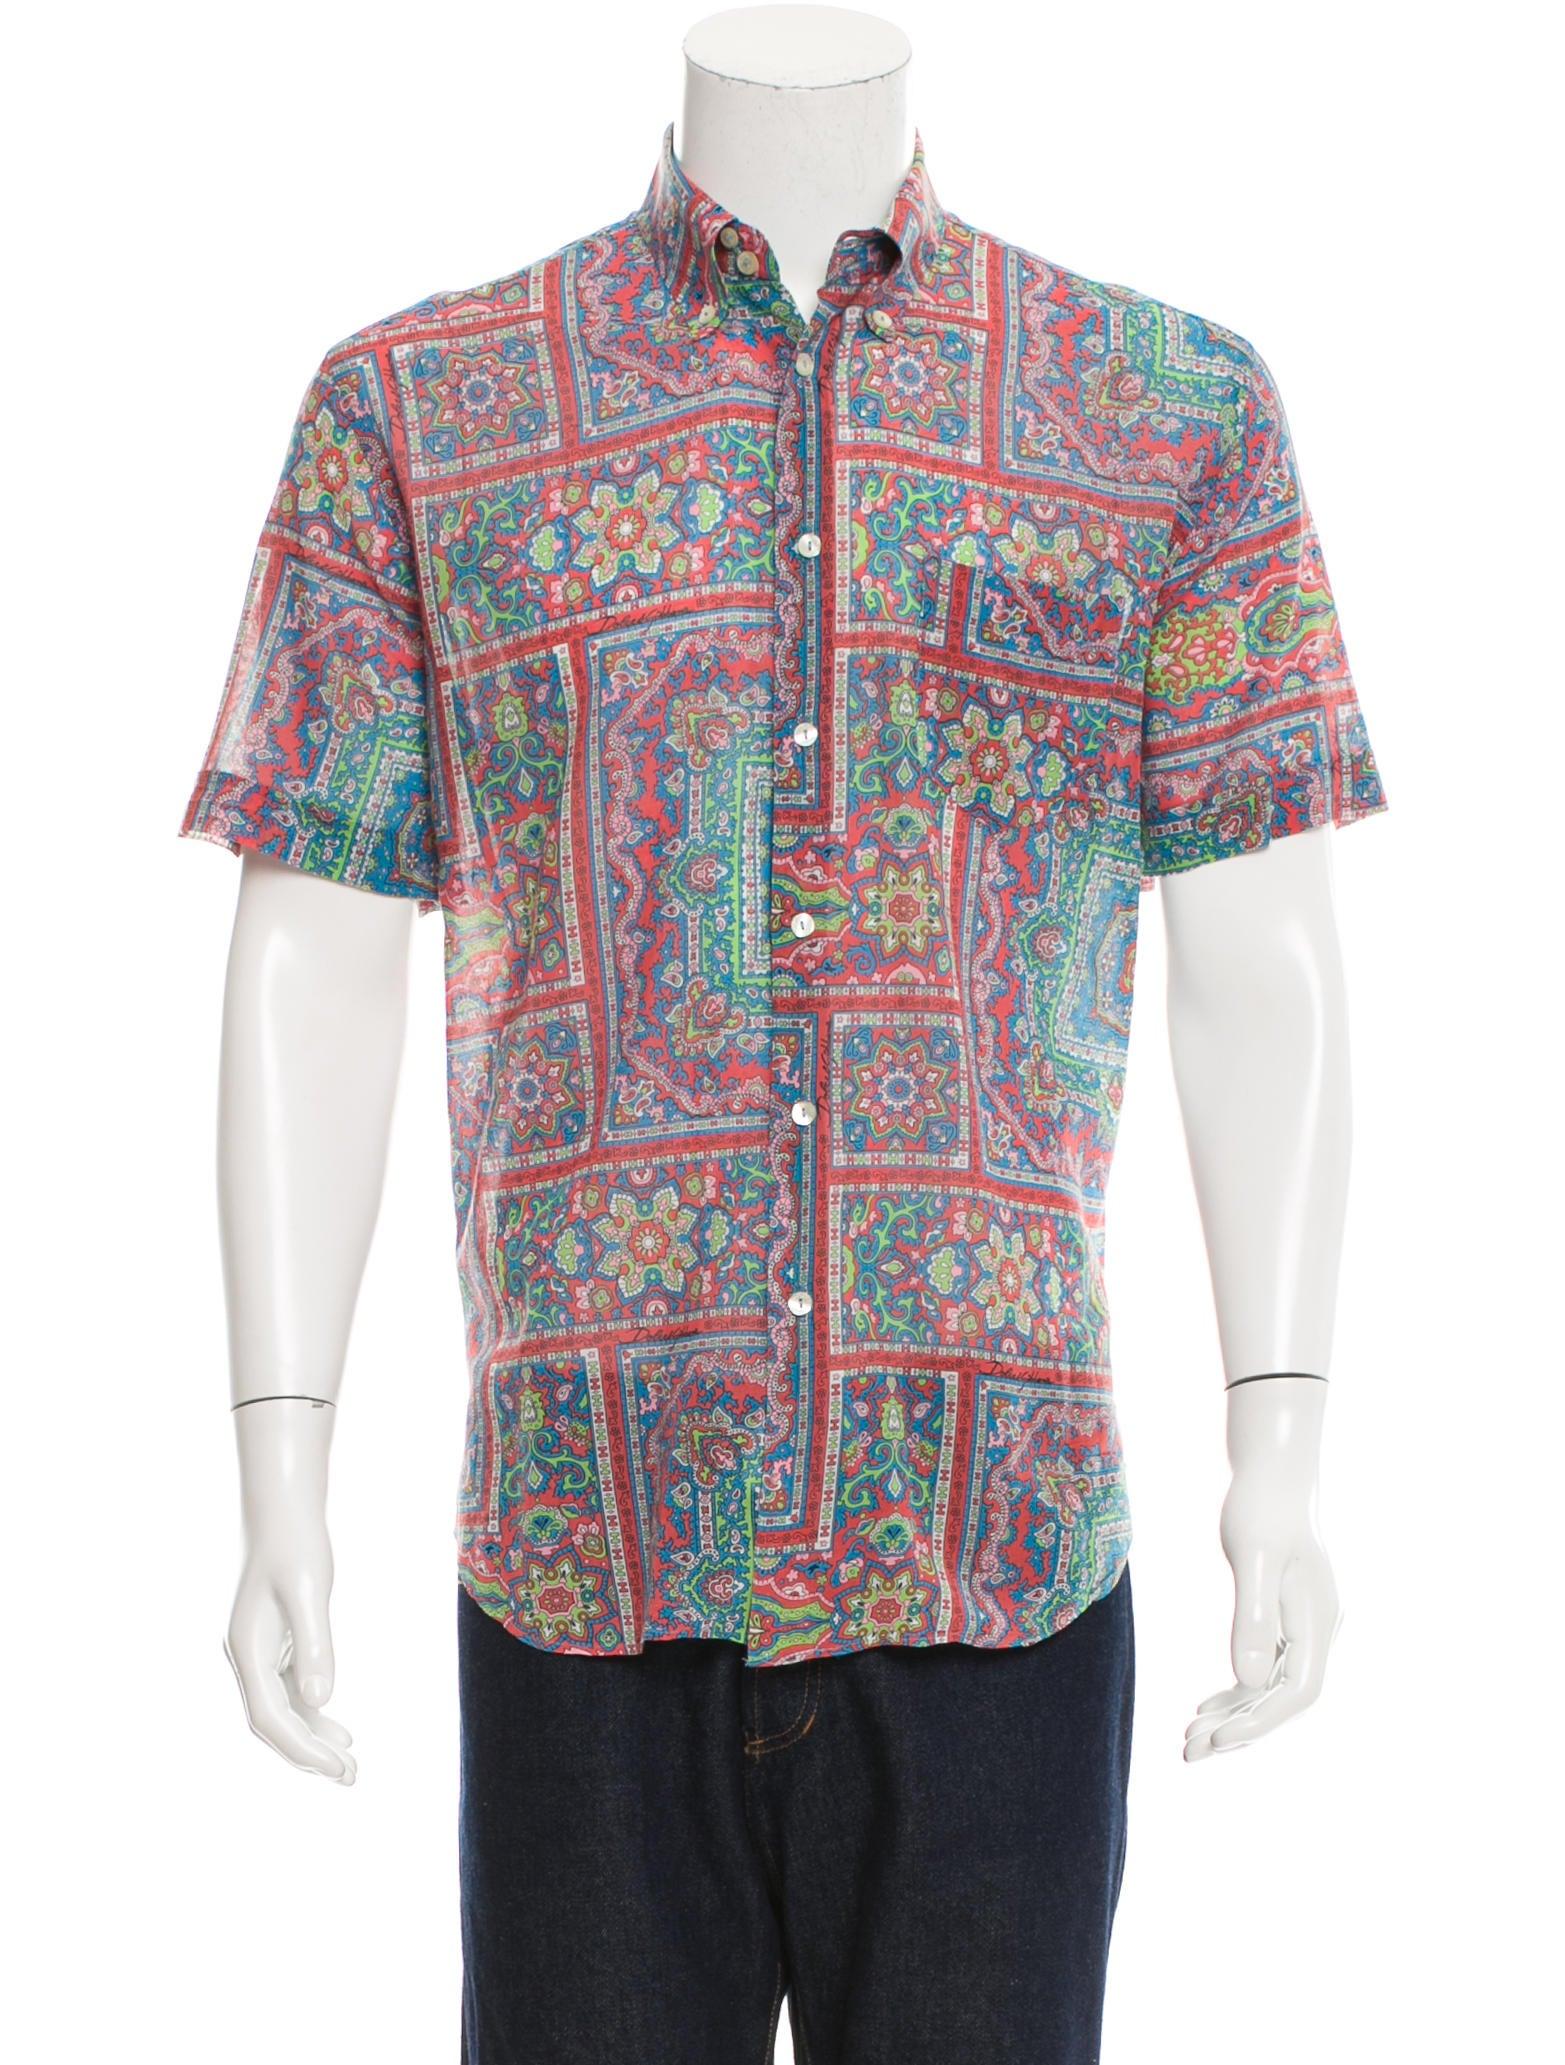 Dolce gabbana printed button up shirt clothing for Dolce and gabbana printed t shirts